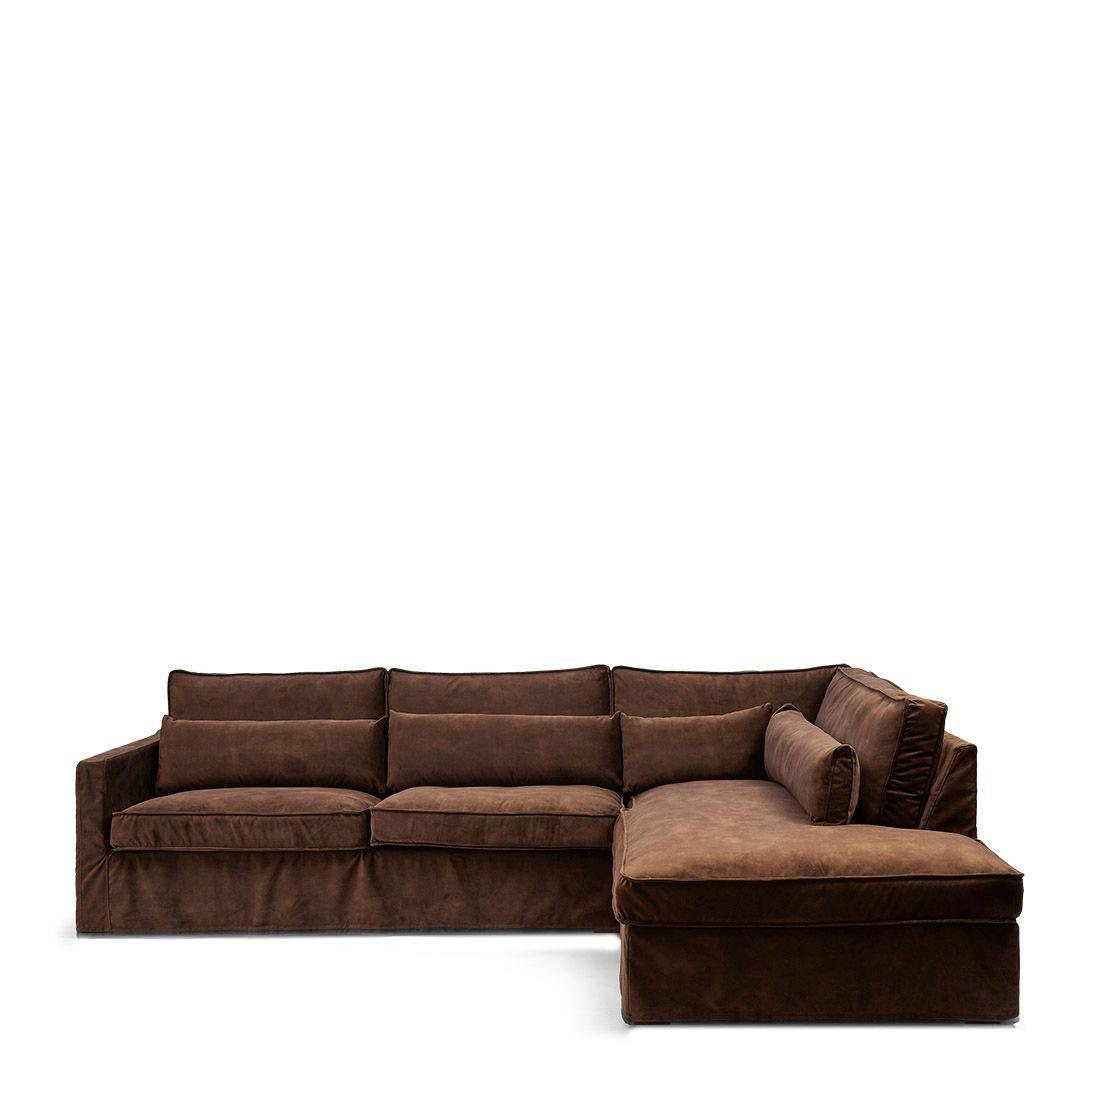 Brompton Cross Corner Sofa Chaise Longue Right, velvet, chocolate / Rivièra Maison